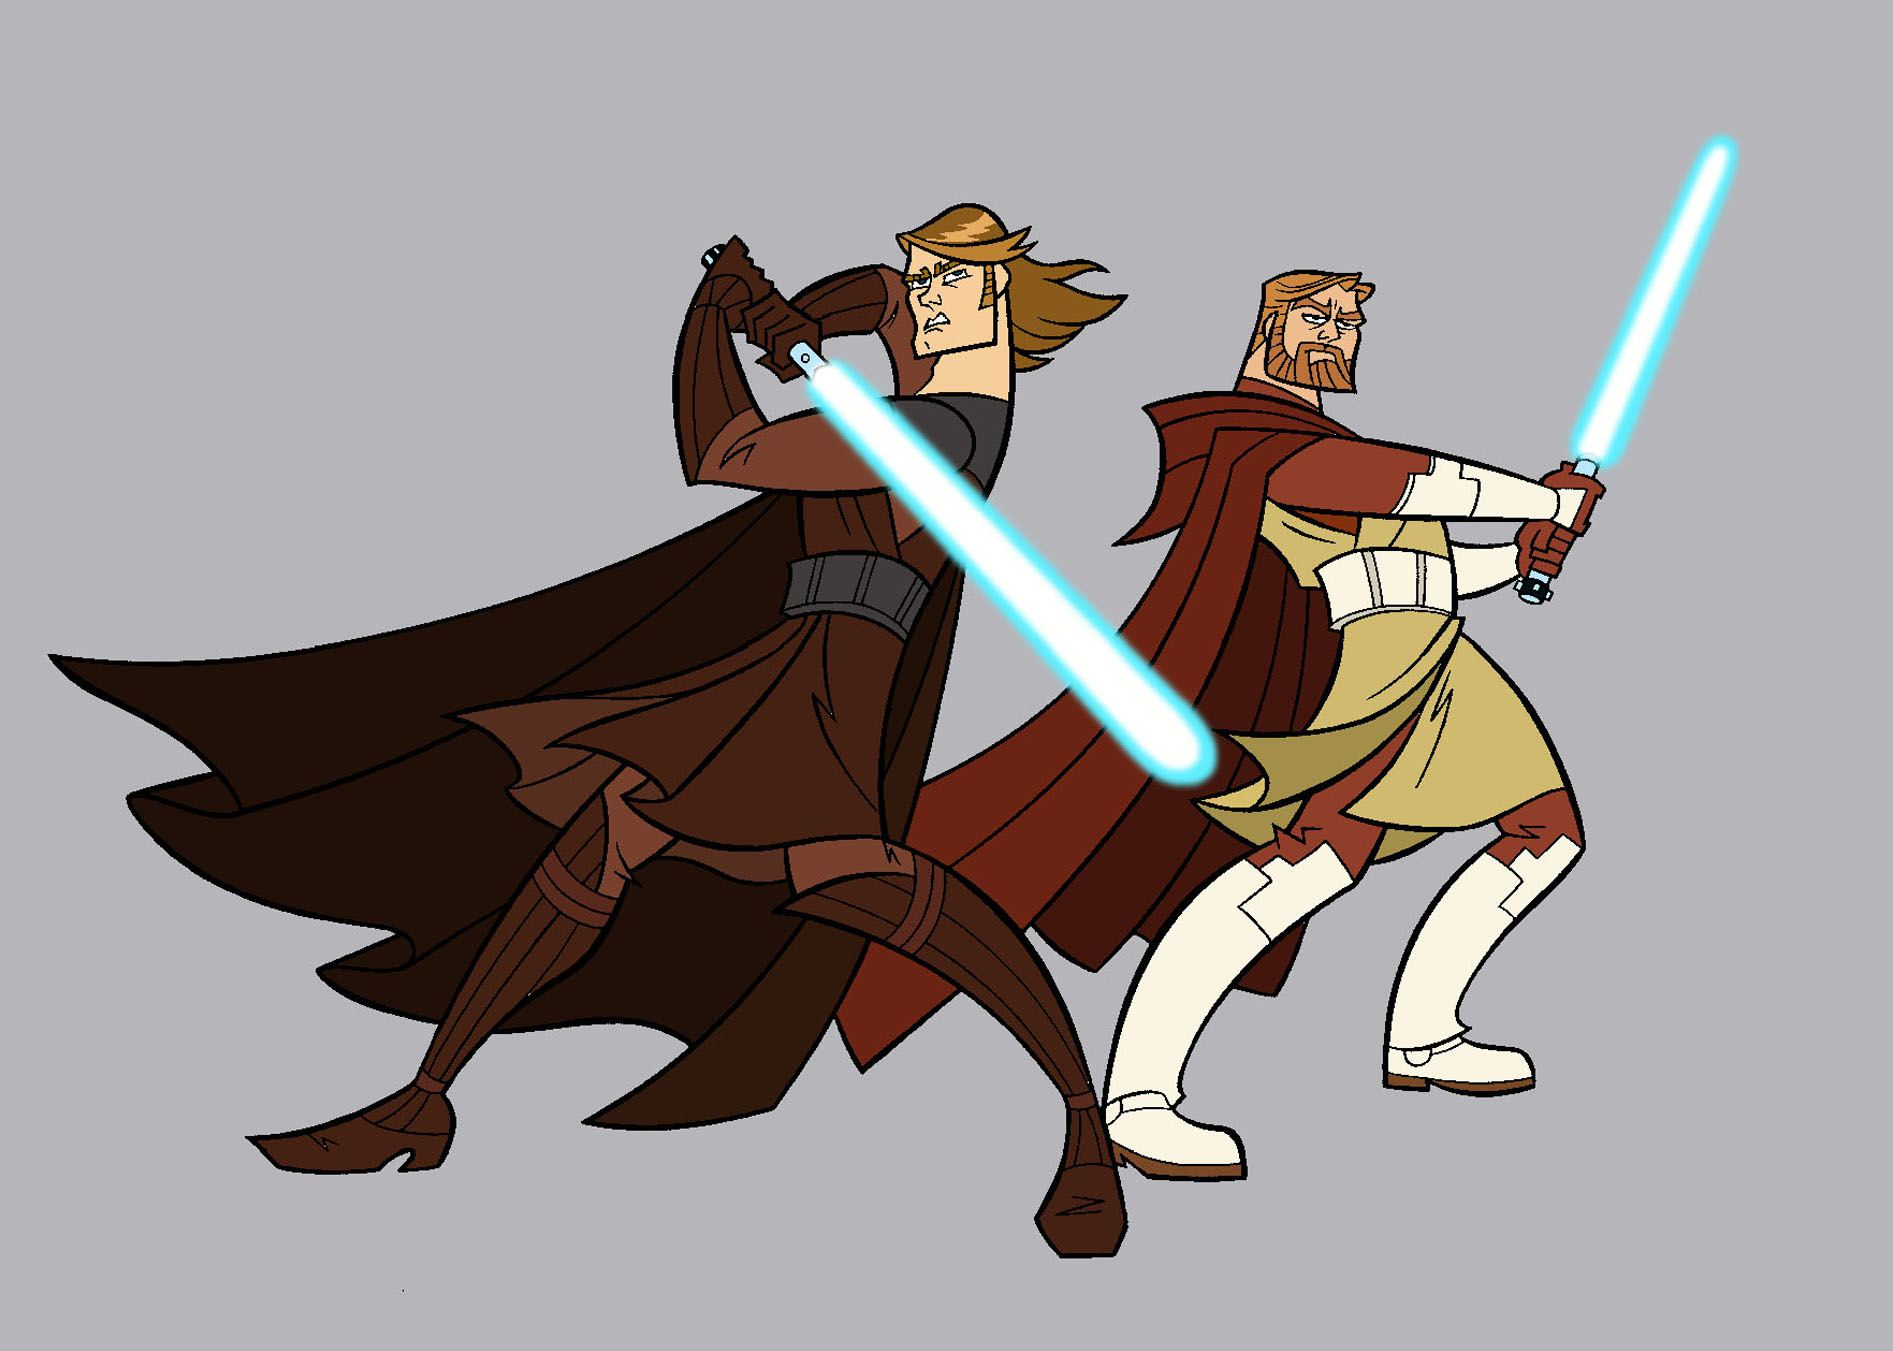 'Clone Wars' Jedi Knights Anakin and Obi Wan